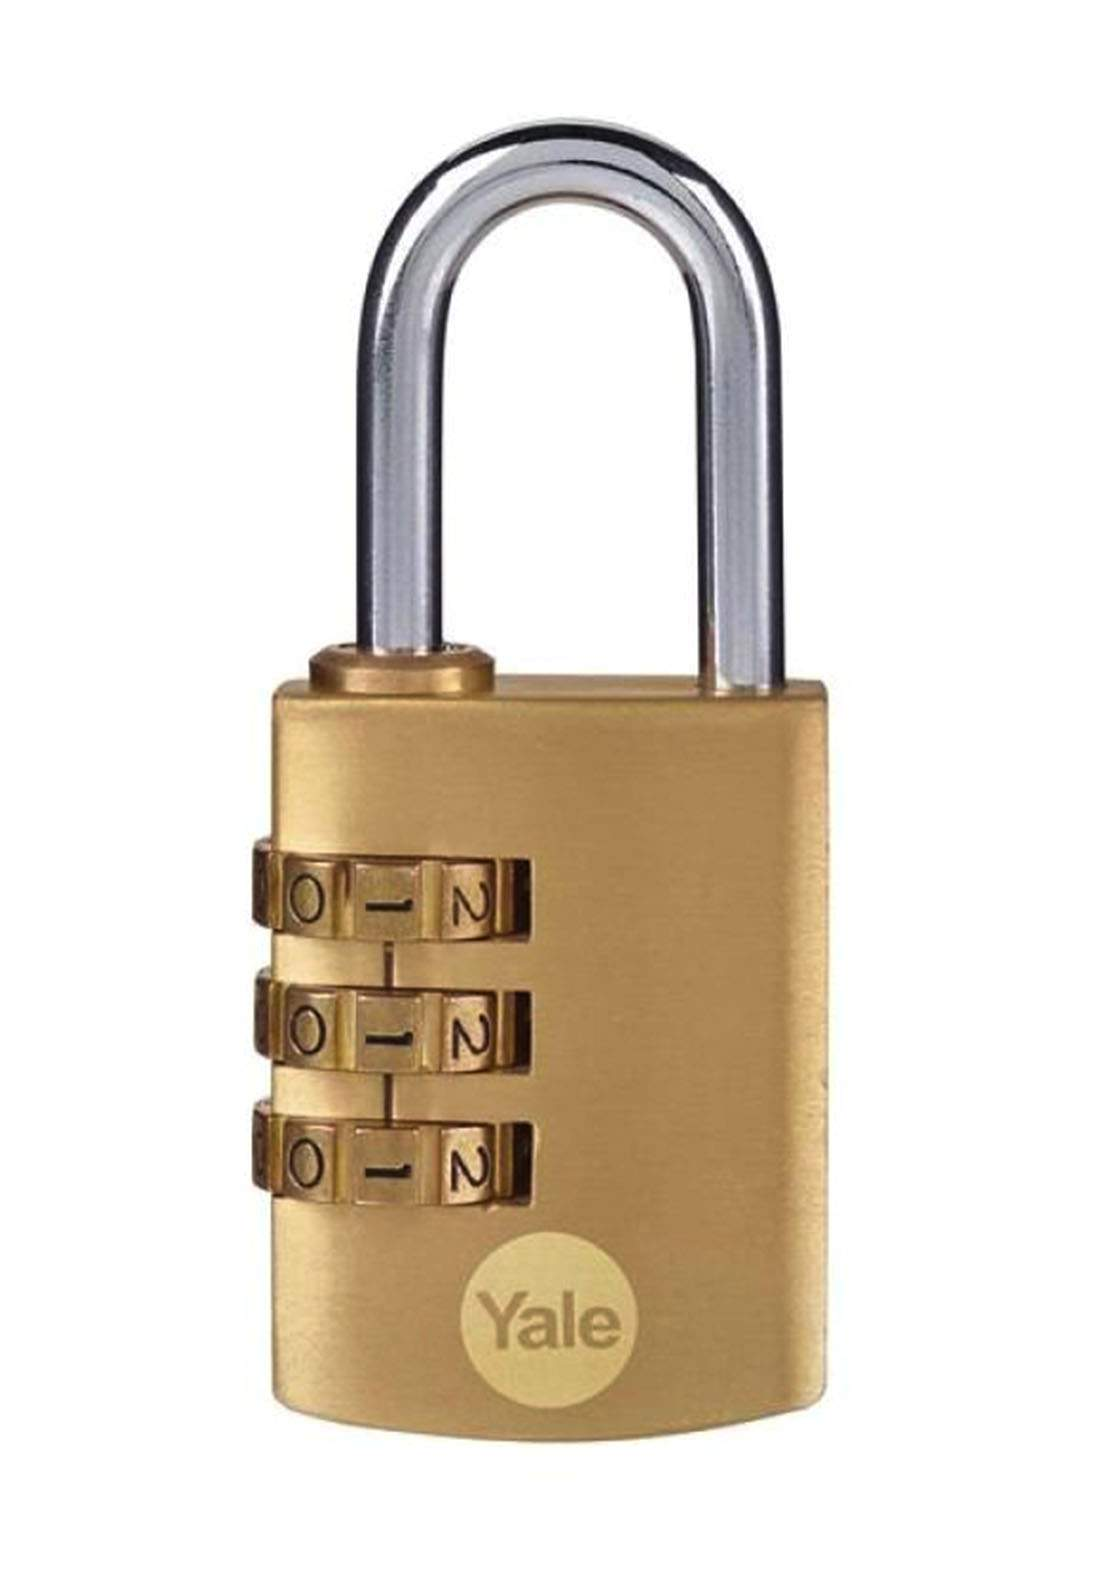 YaleY150B/40/130/1 Padlock Brass 30 mm قفل  برمز رقمي